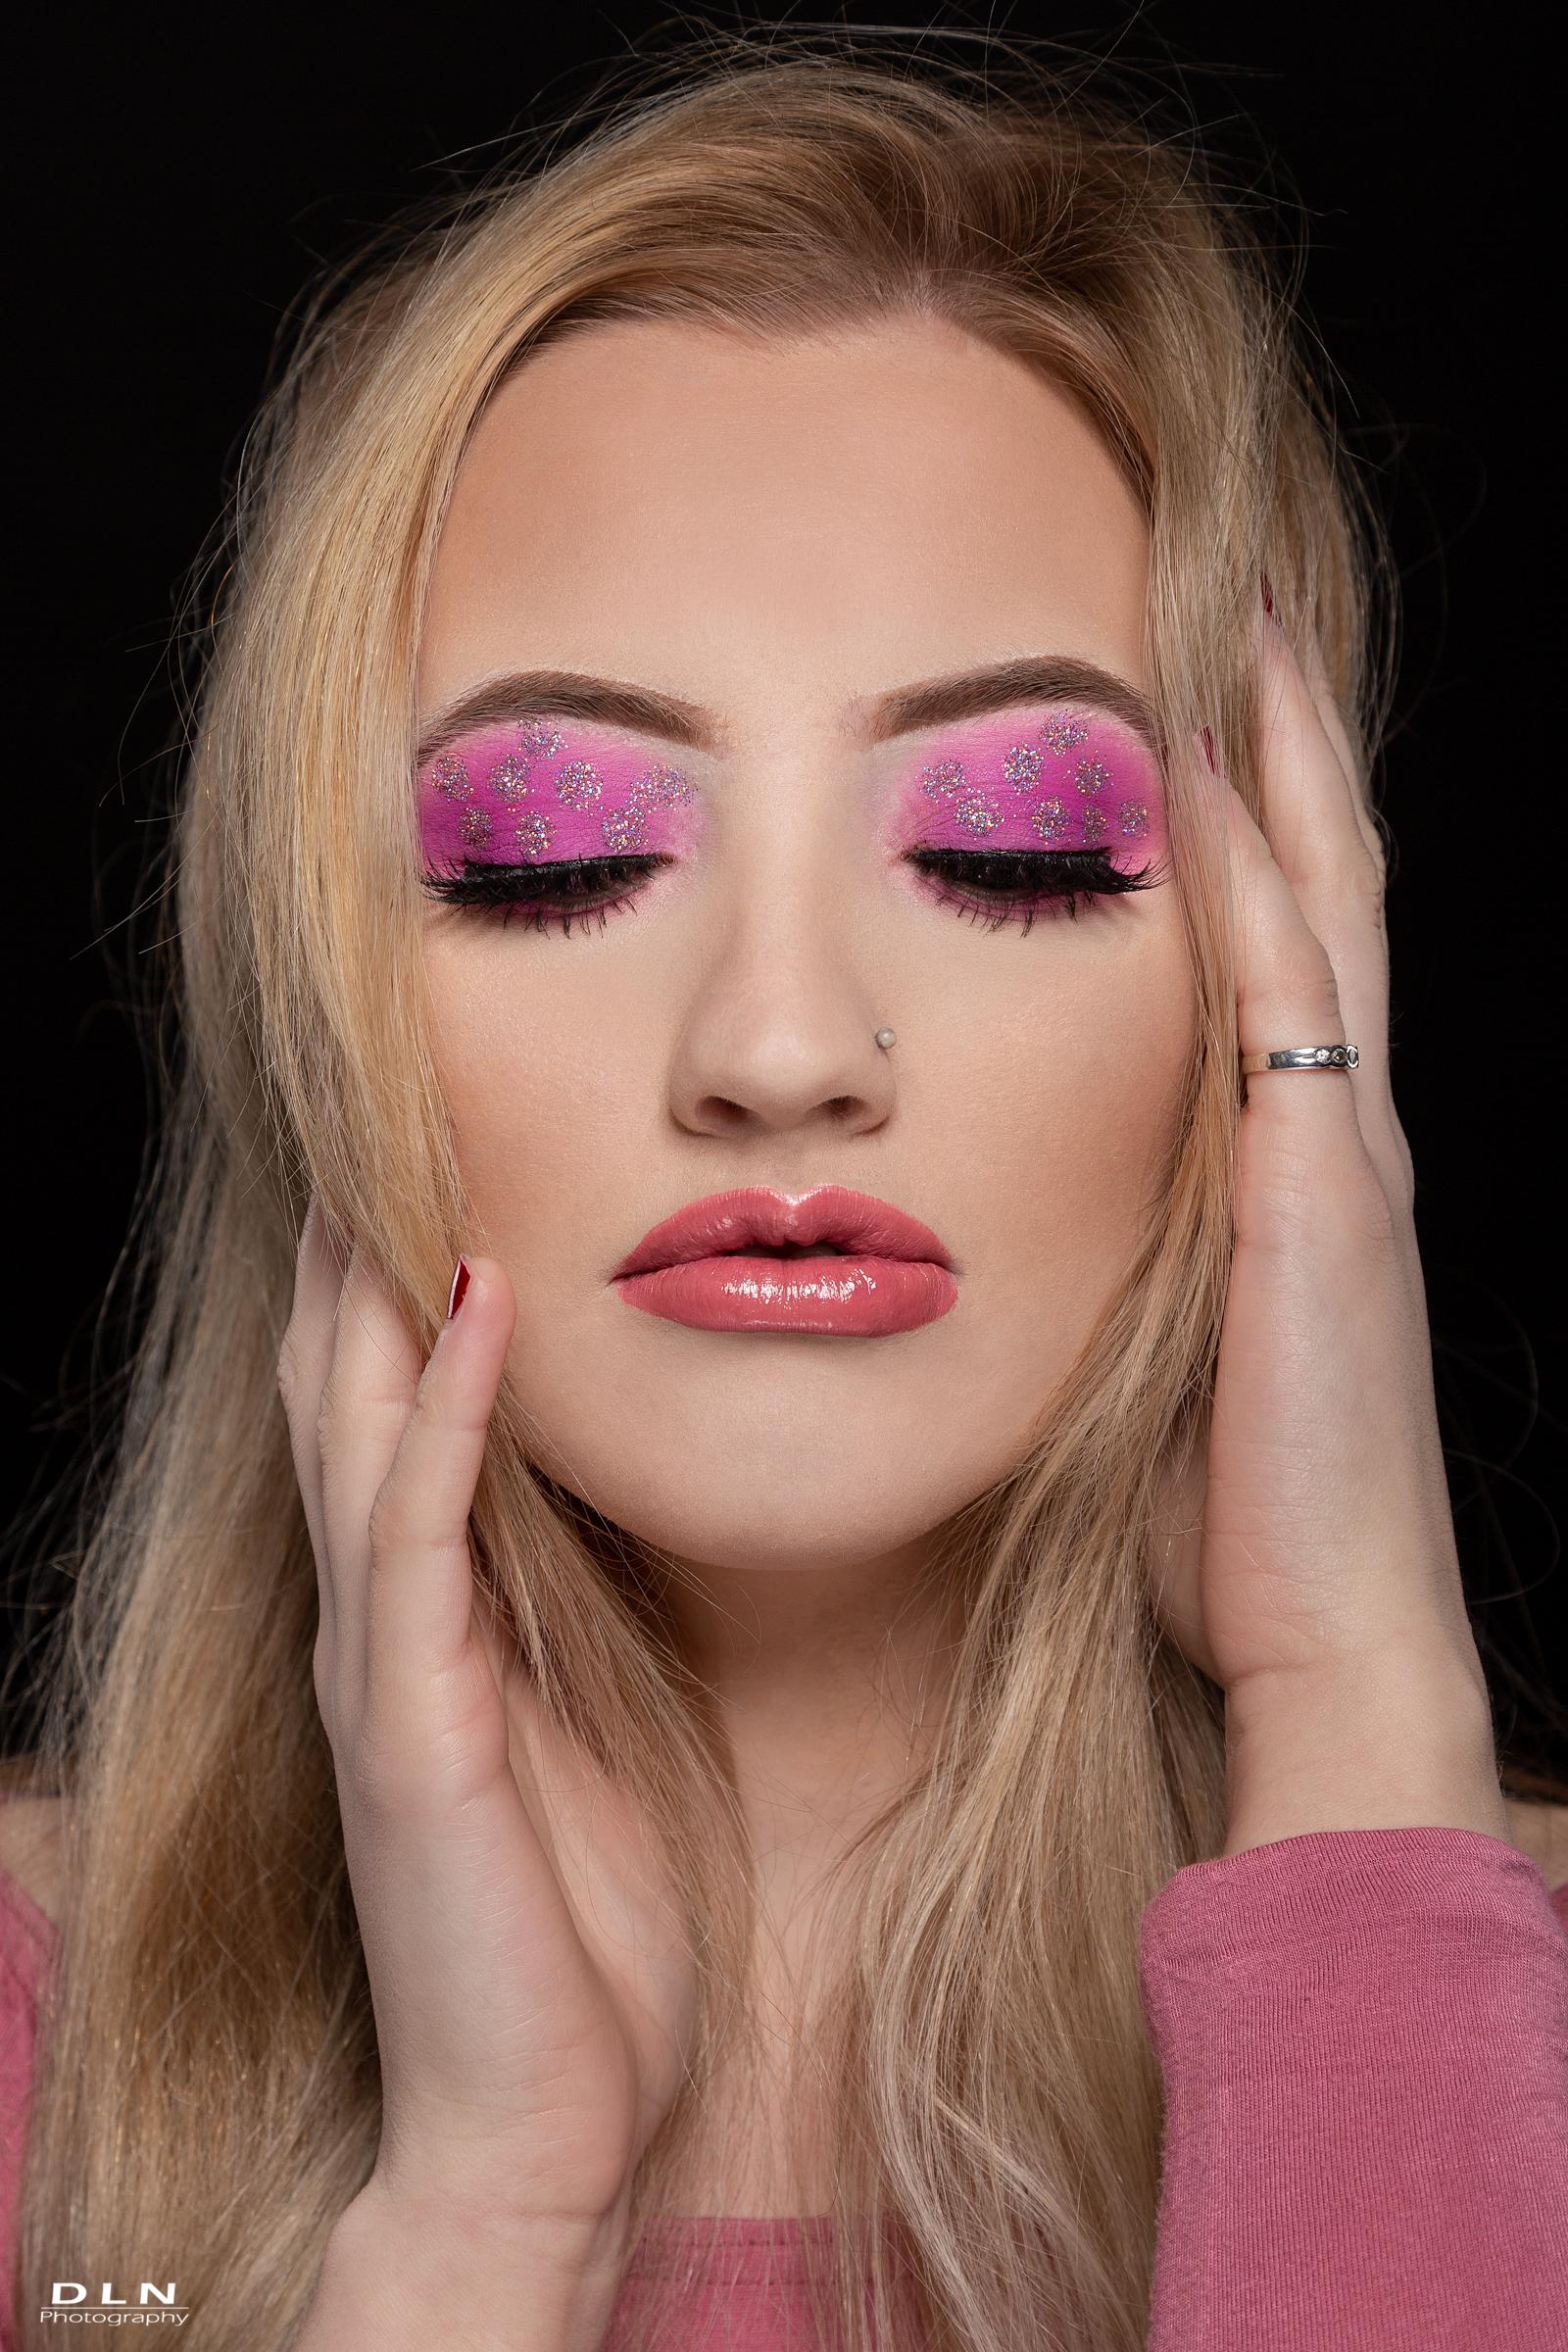 Alyssa Make Up Looks WEB-2.jpg